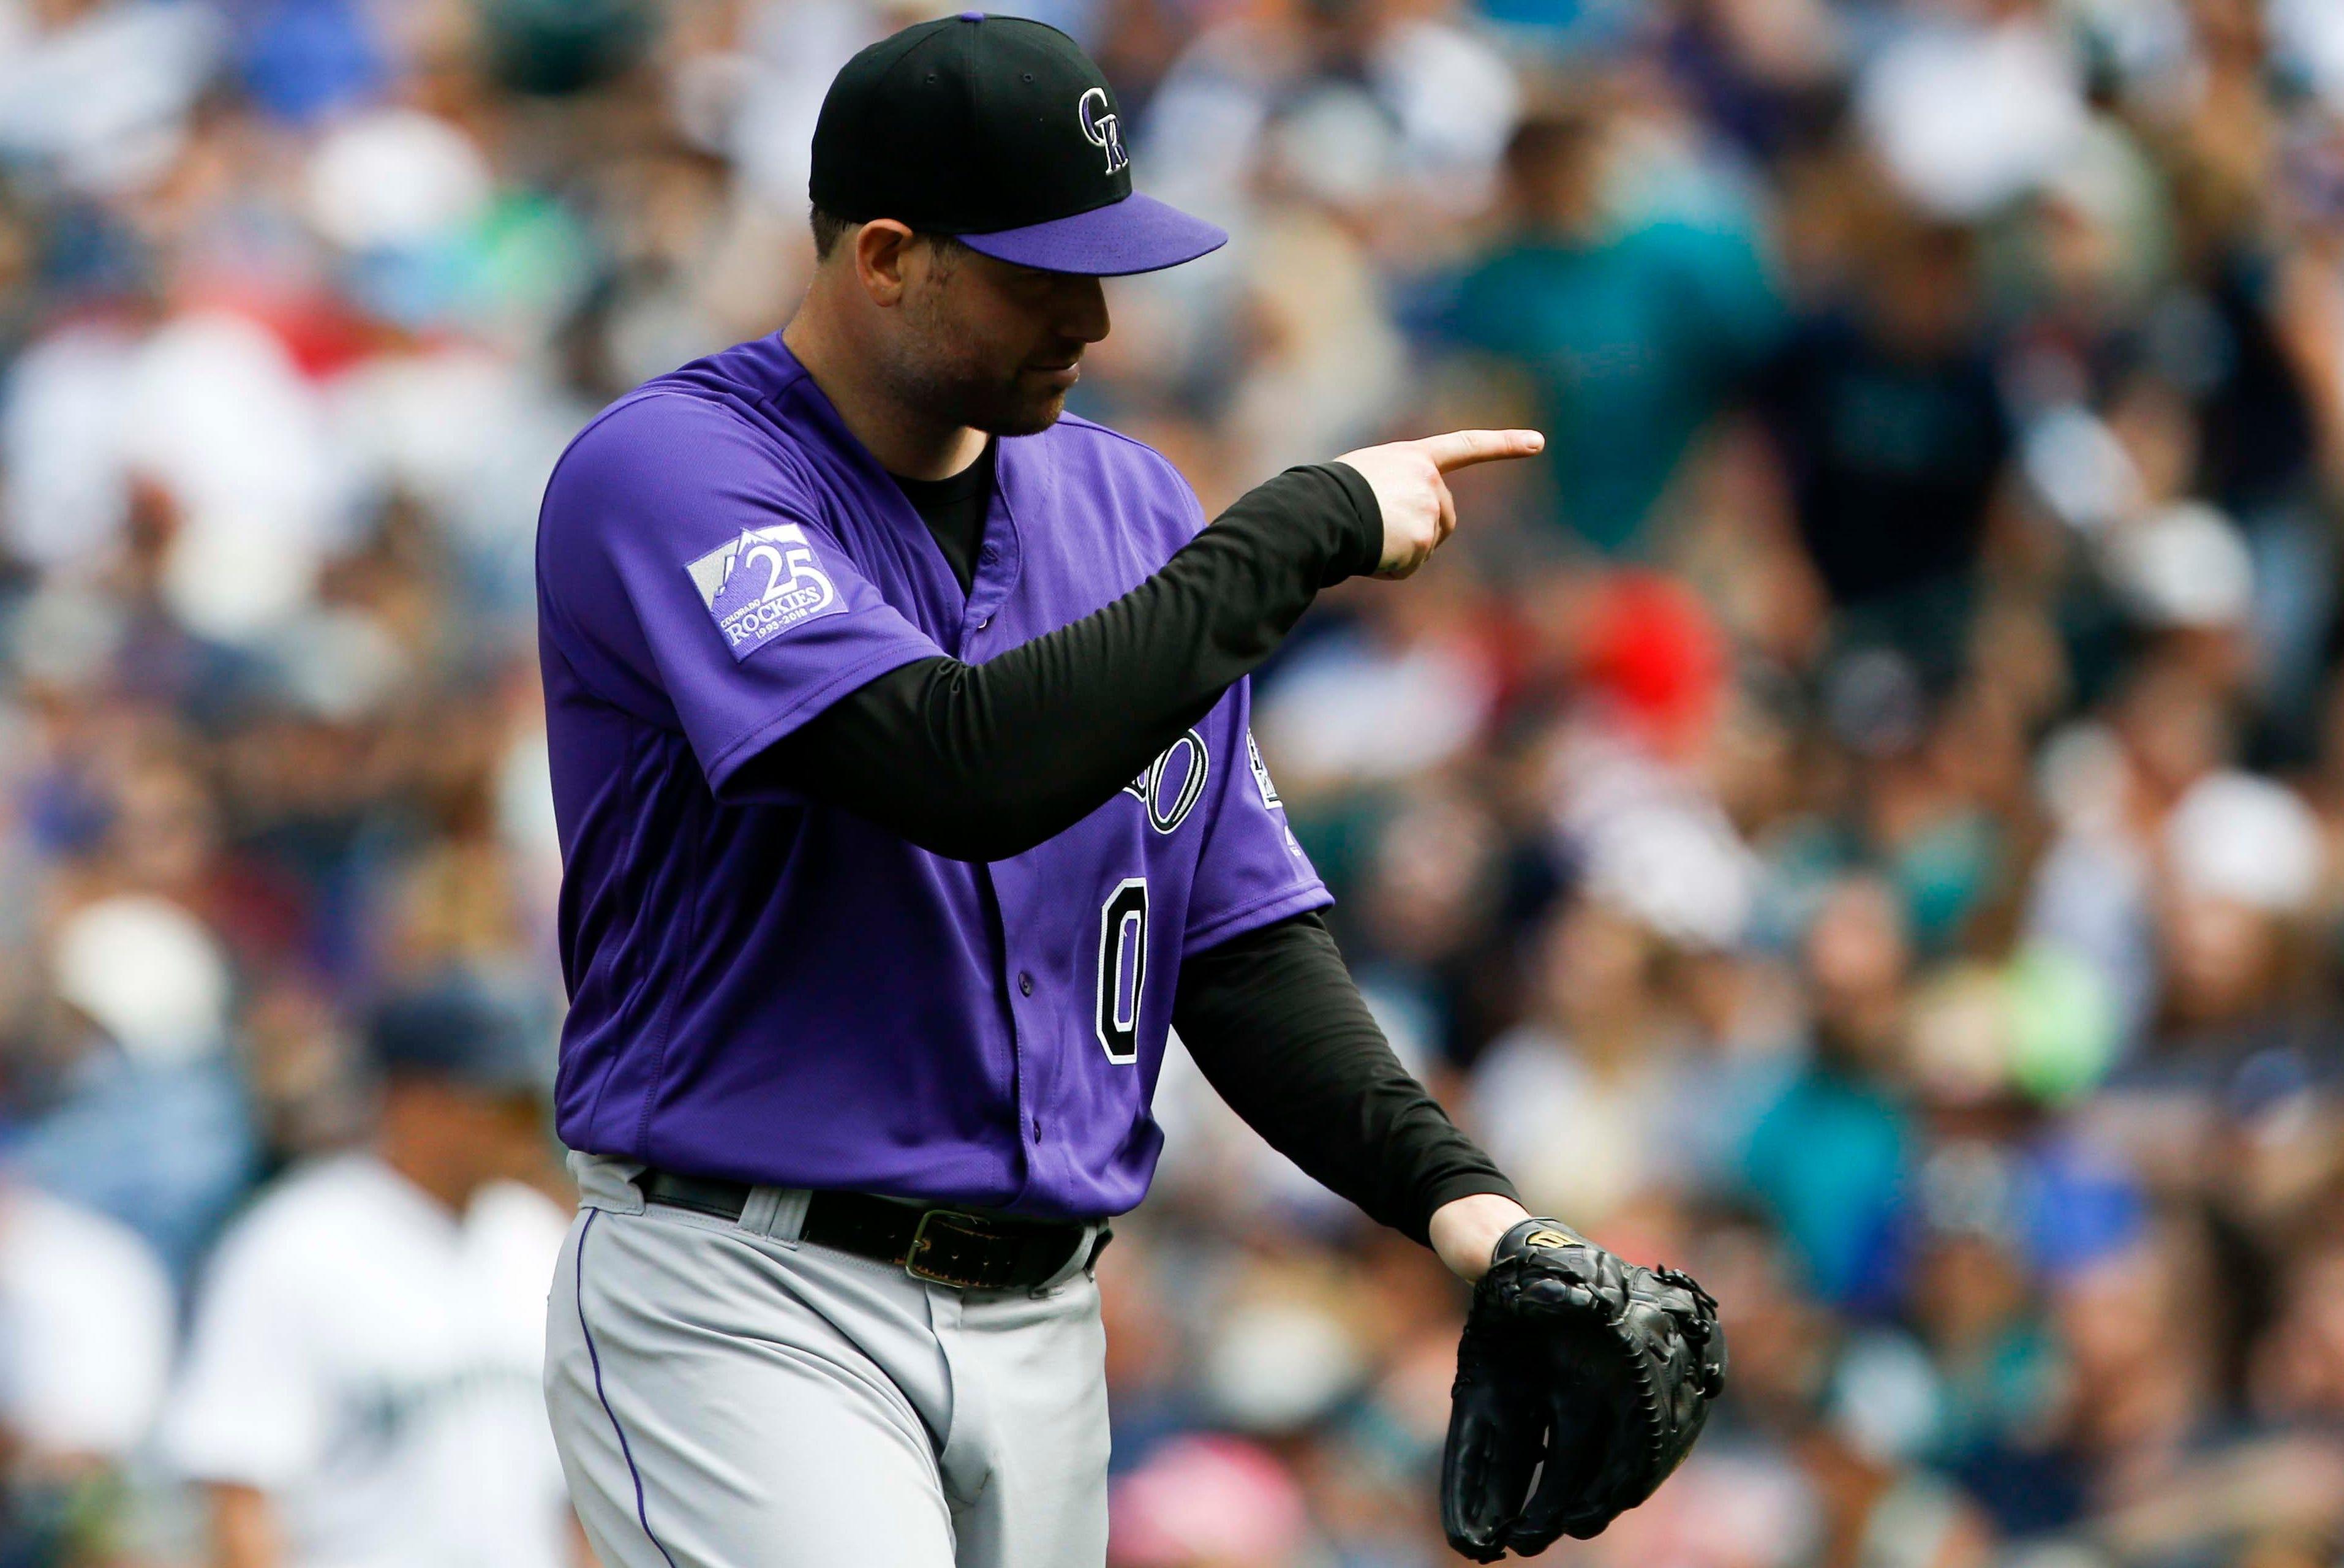 Ottavino struck out 112 hitters in 2018.